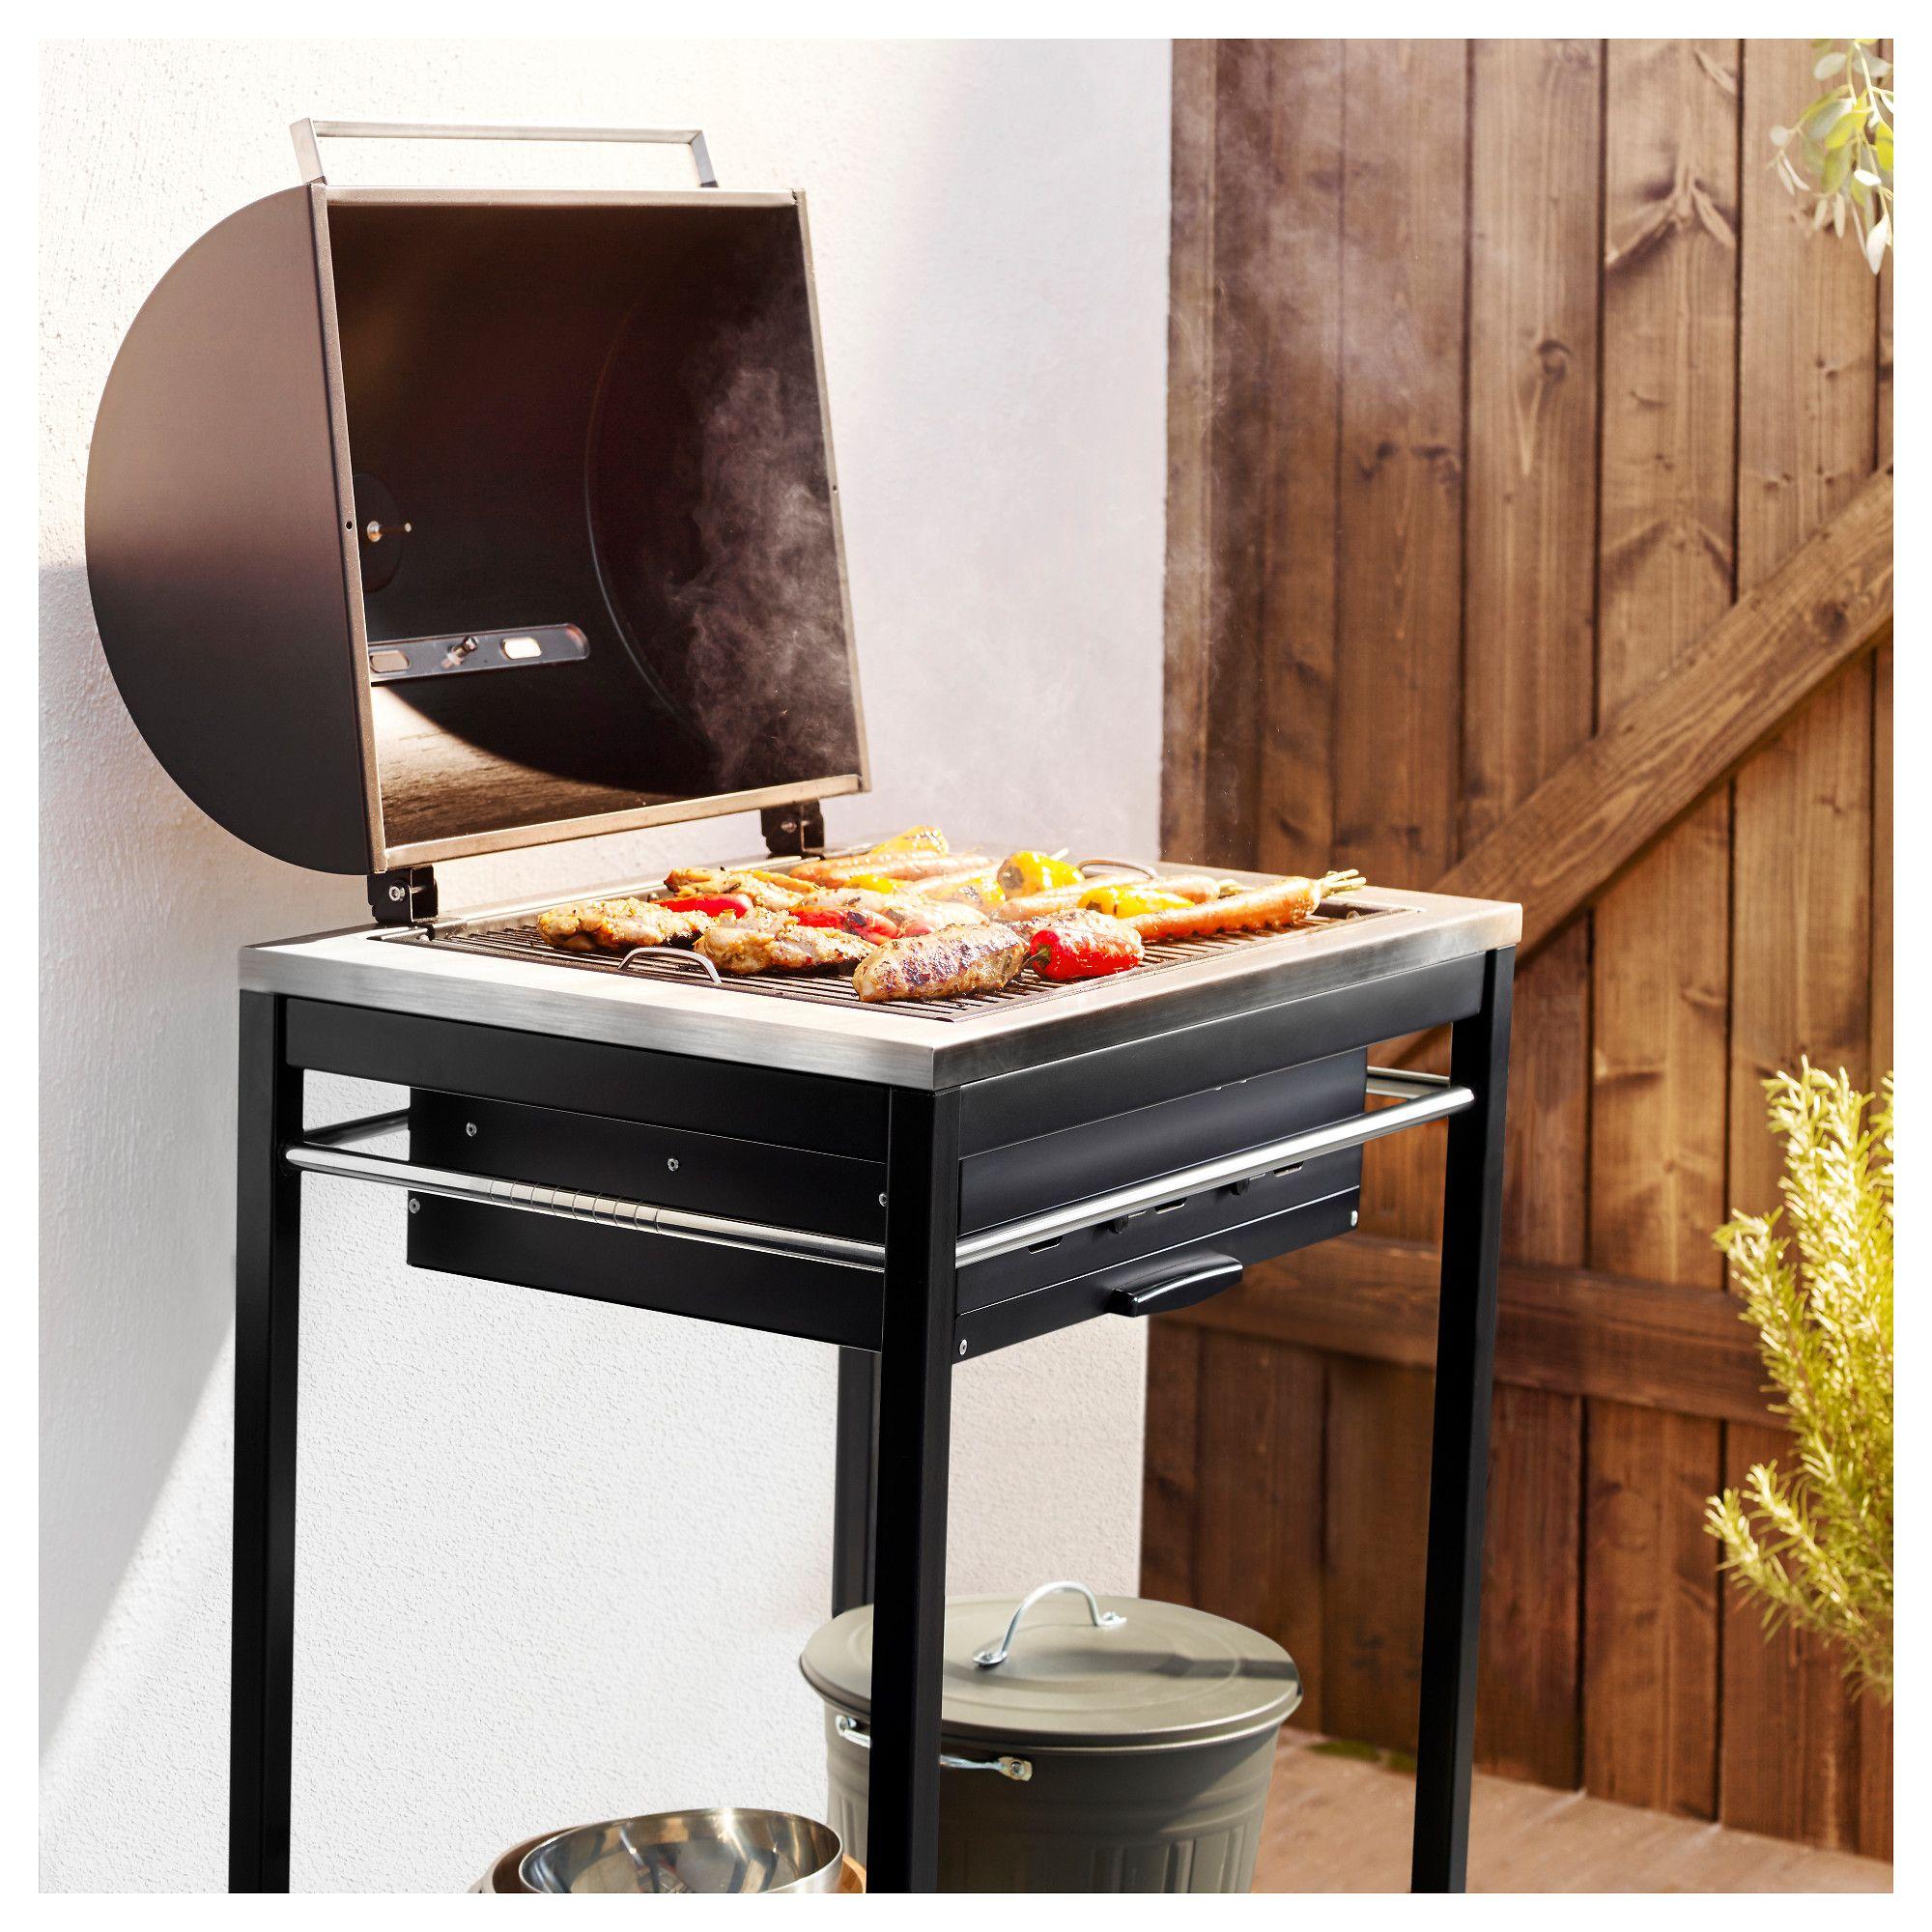 Klasen Charcoal Grill Ikea Ananda Exterior Pinterest  # Muebles Rivelli